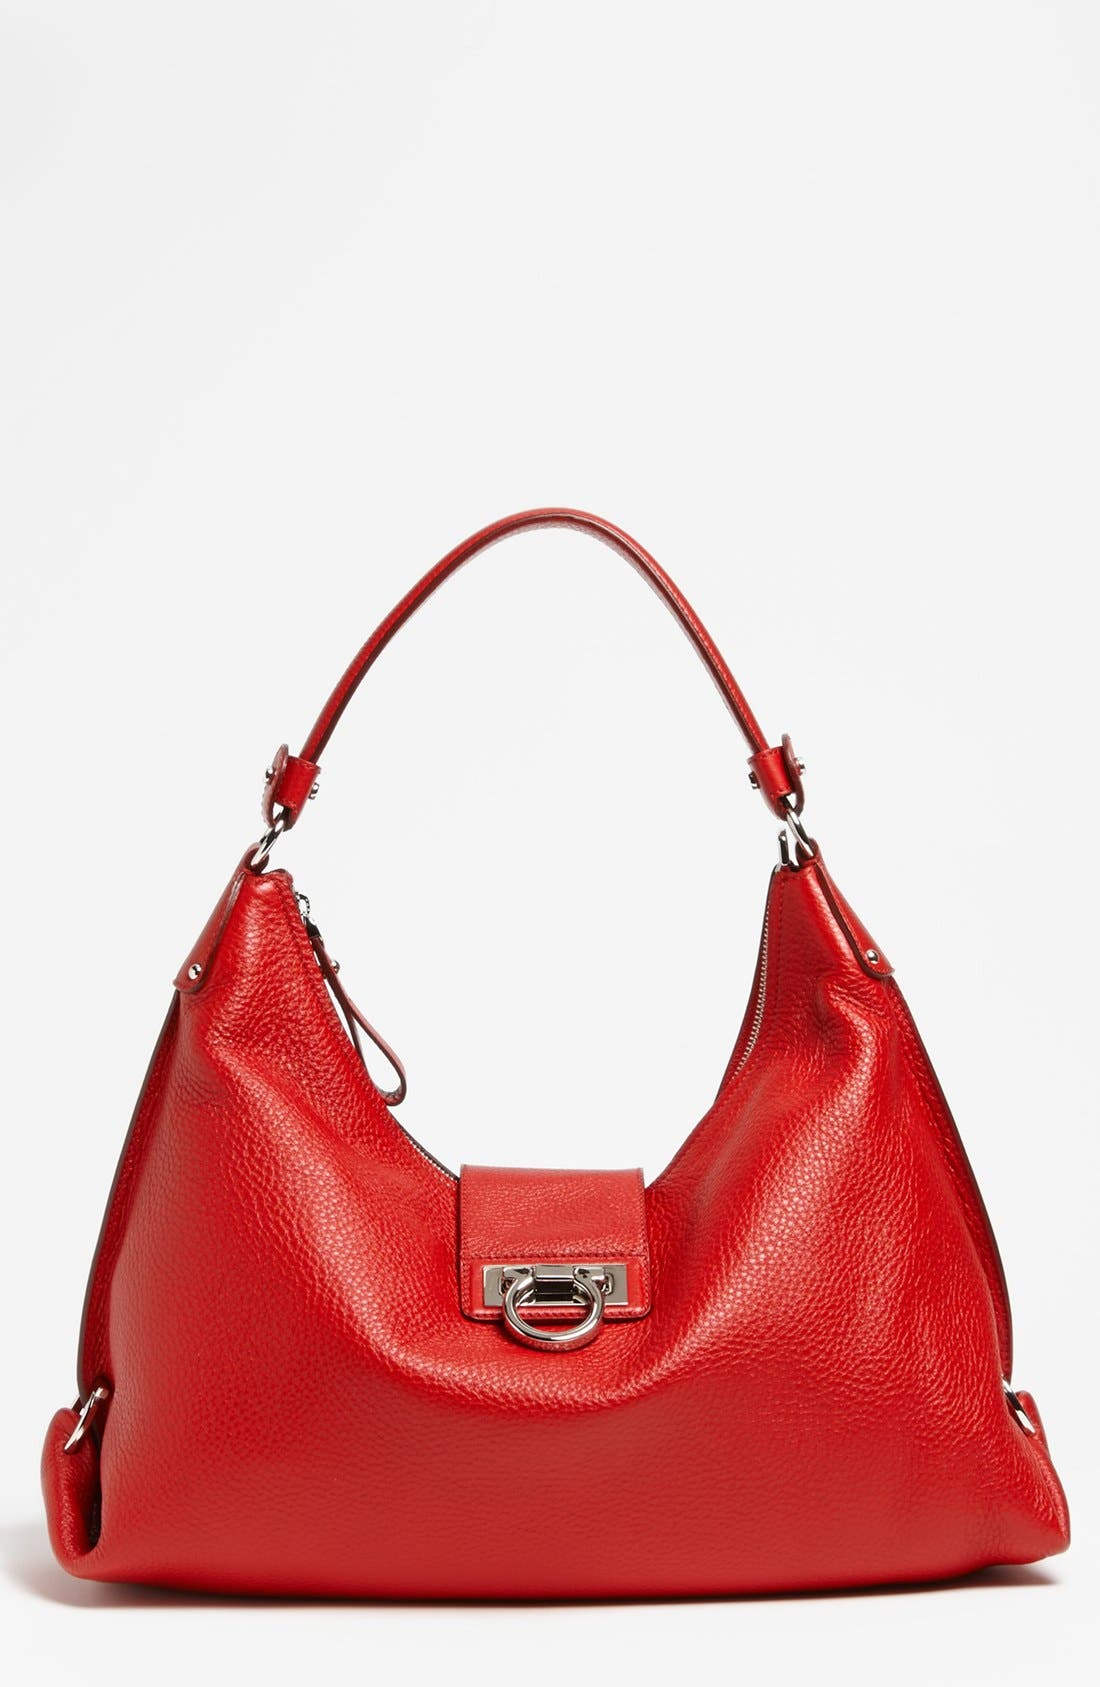 Alternate Image 1 Selected - Salvatore Ferragamo 'New Fanisa' Leather Hobo